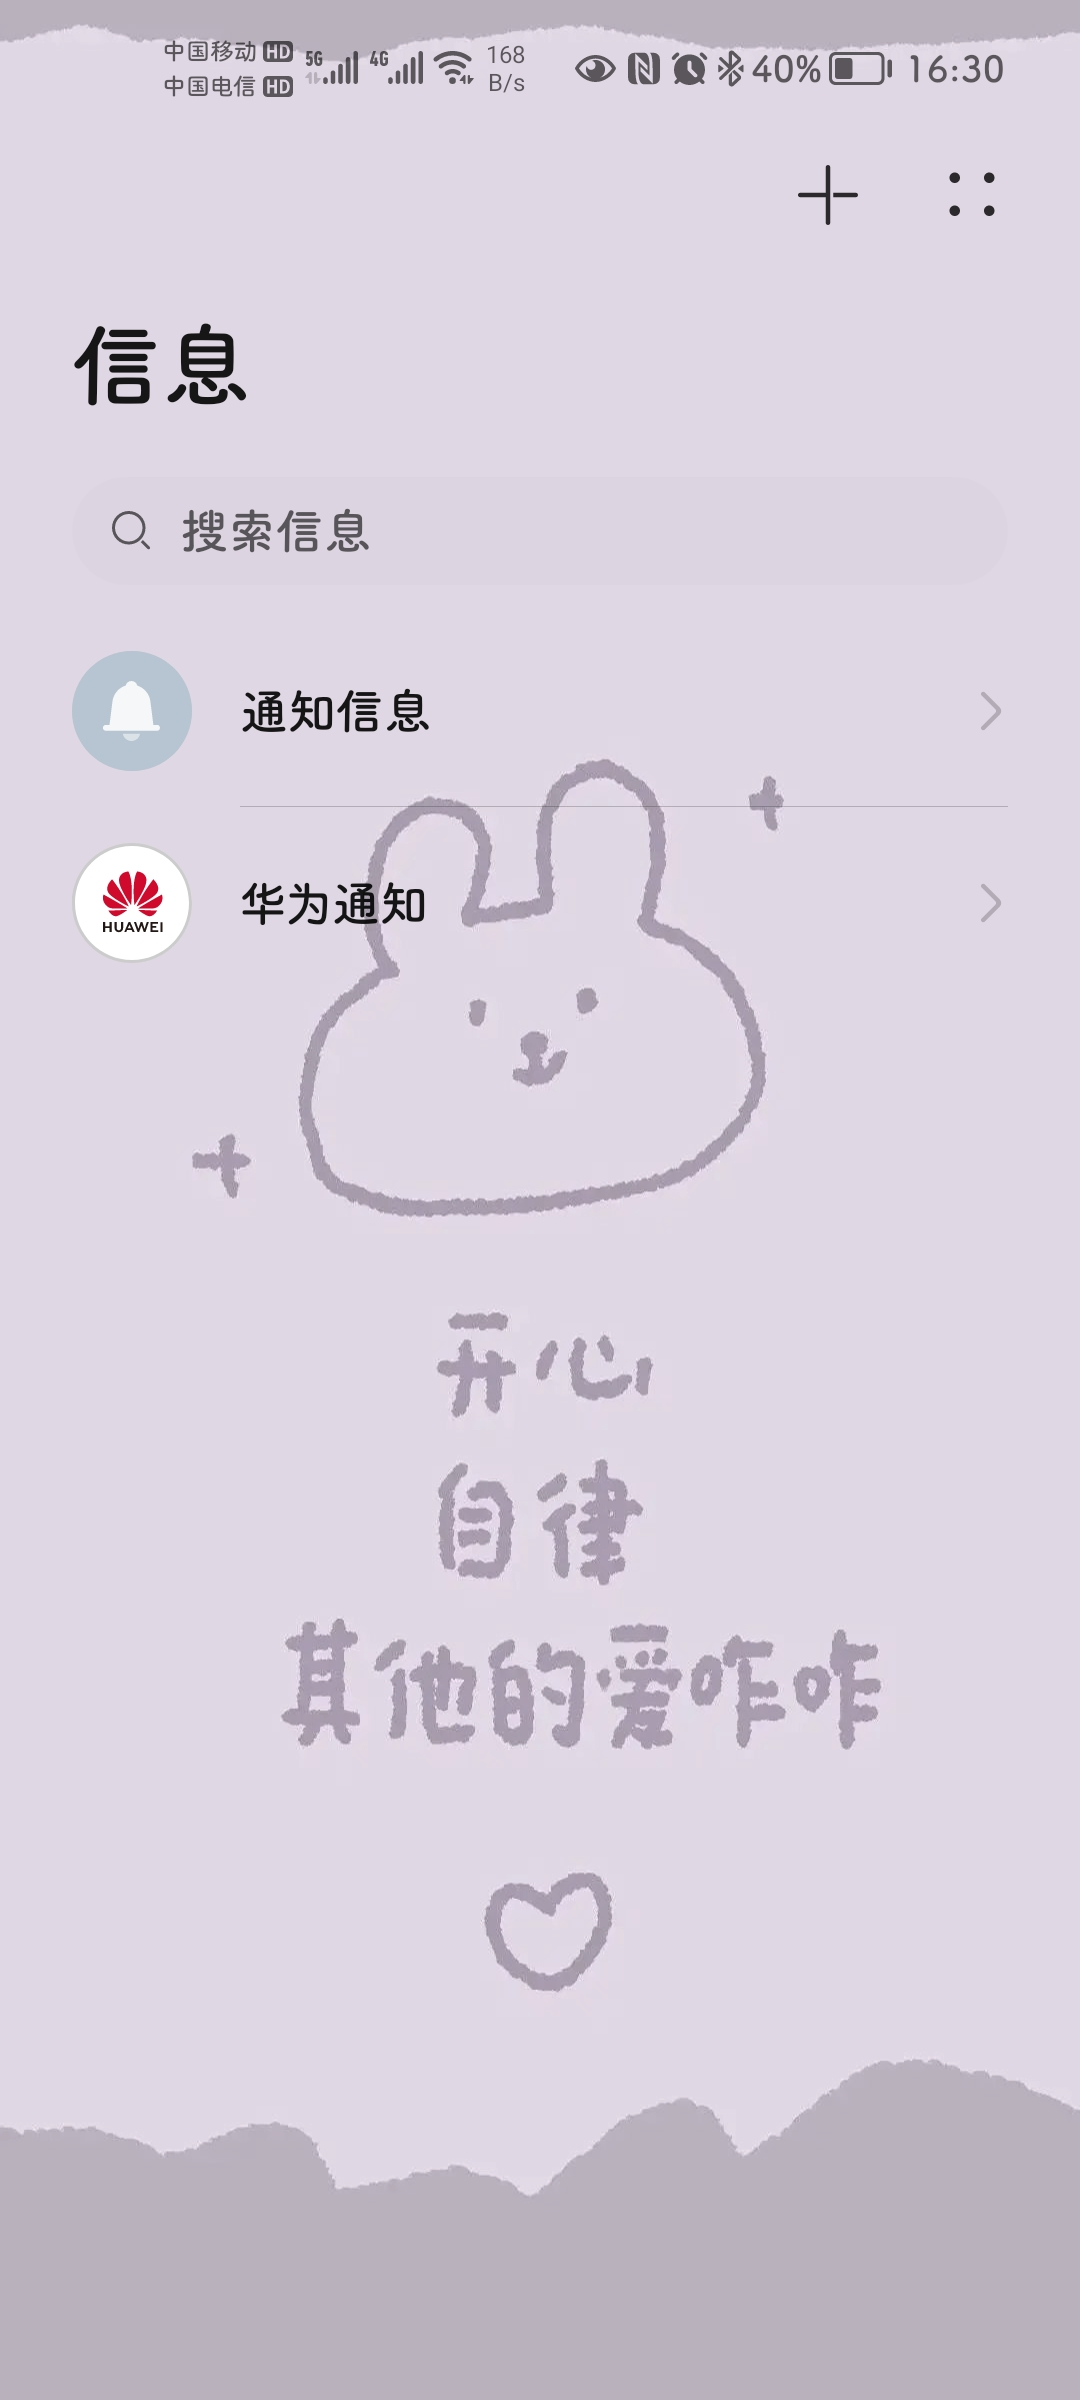 Screenshot_20210908_163049_com.android.mms.jpg